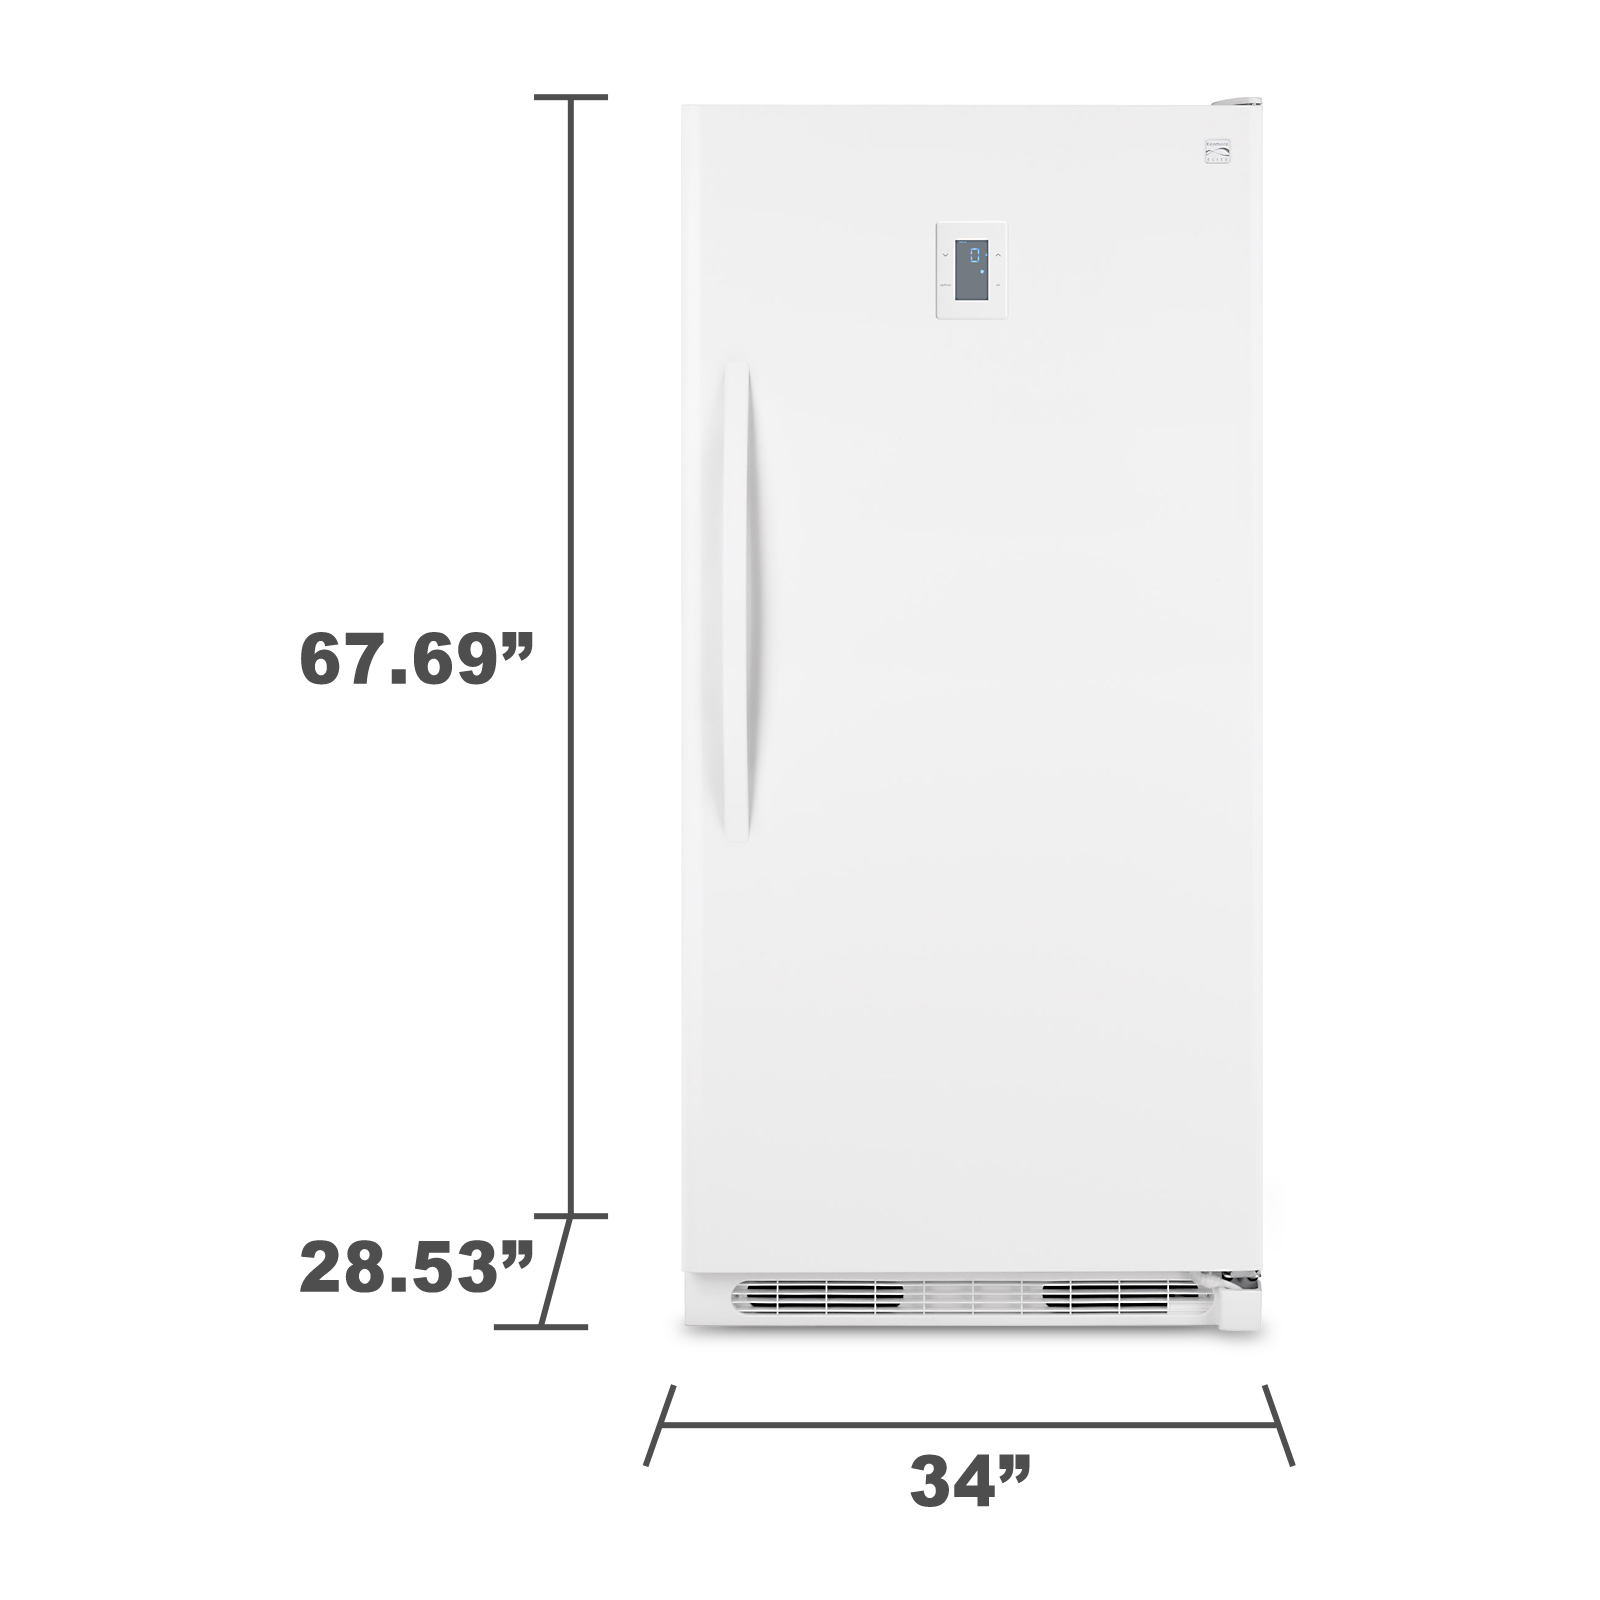 Kenmore Elite 27702 16.6 cu. ft. Upright Freezer - White